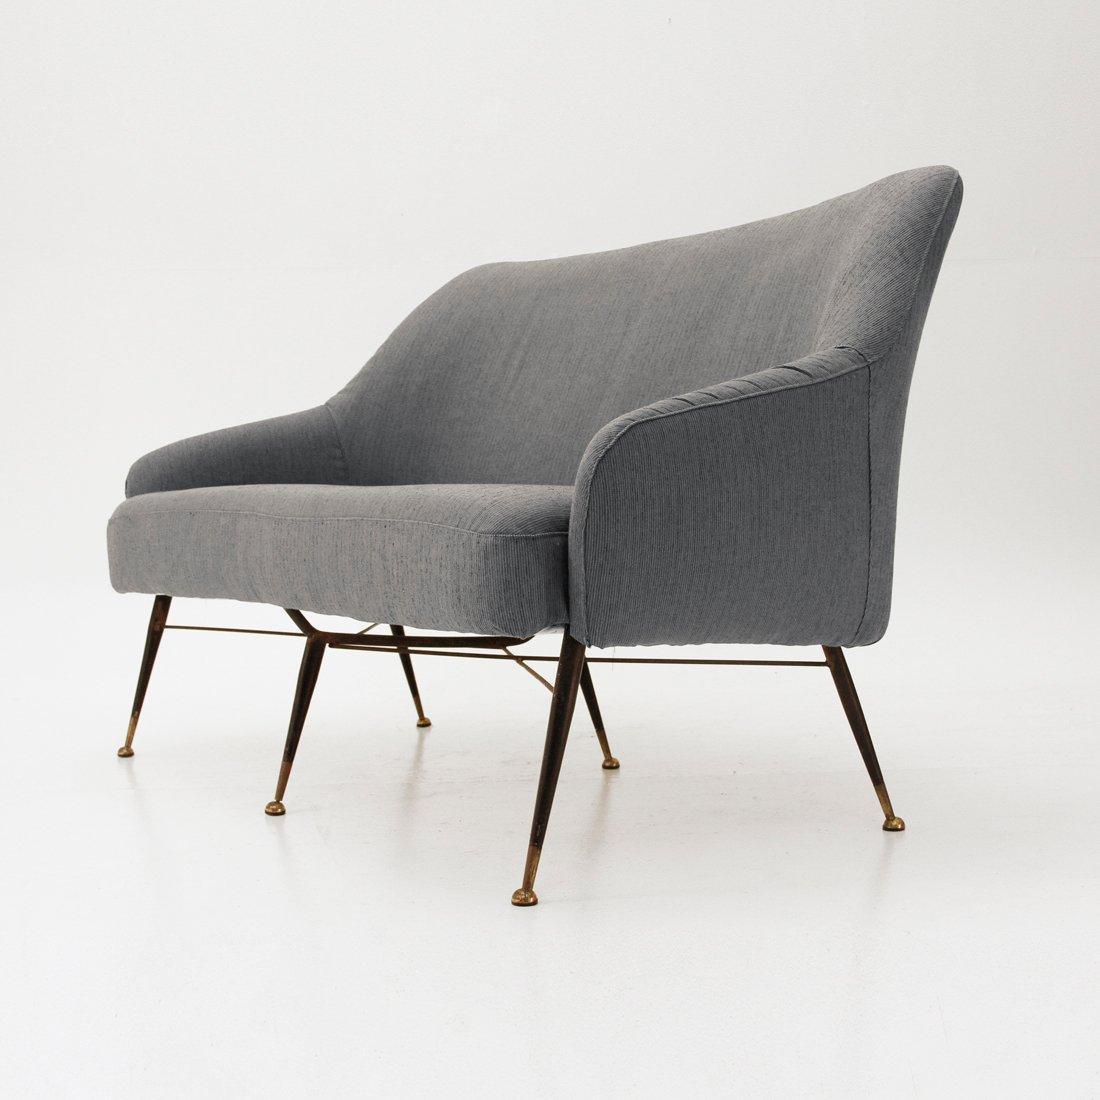 italienisches mid centuy sofa 1950er bei pamono kaufen. Black Bedroom Furniture Sets. Home Design Ideas